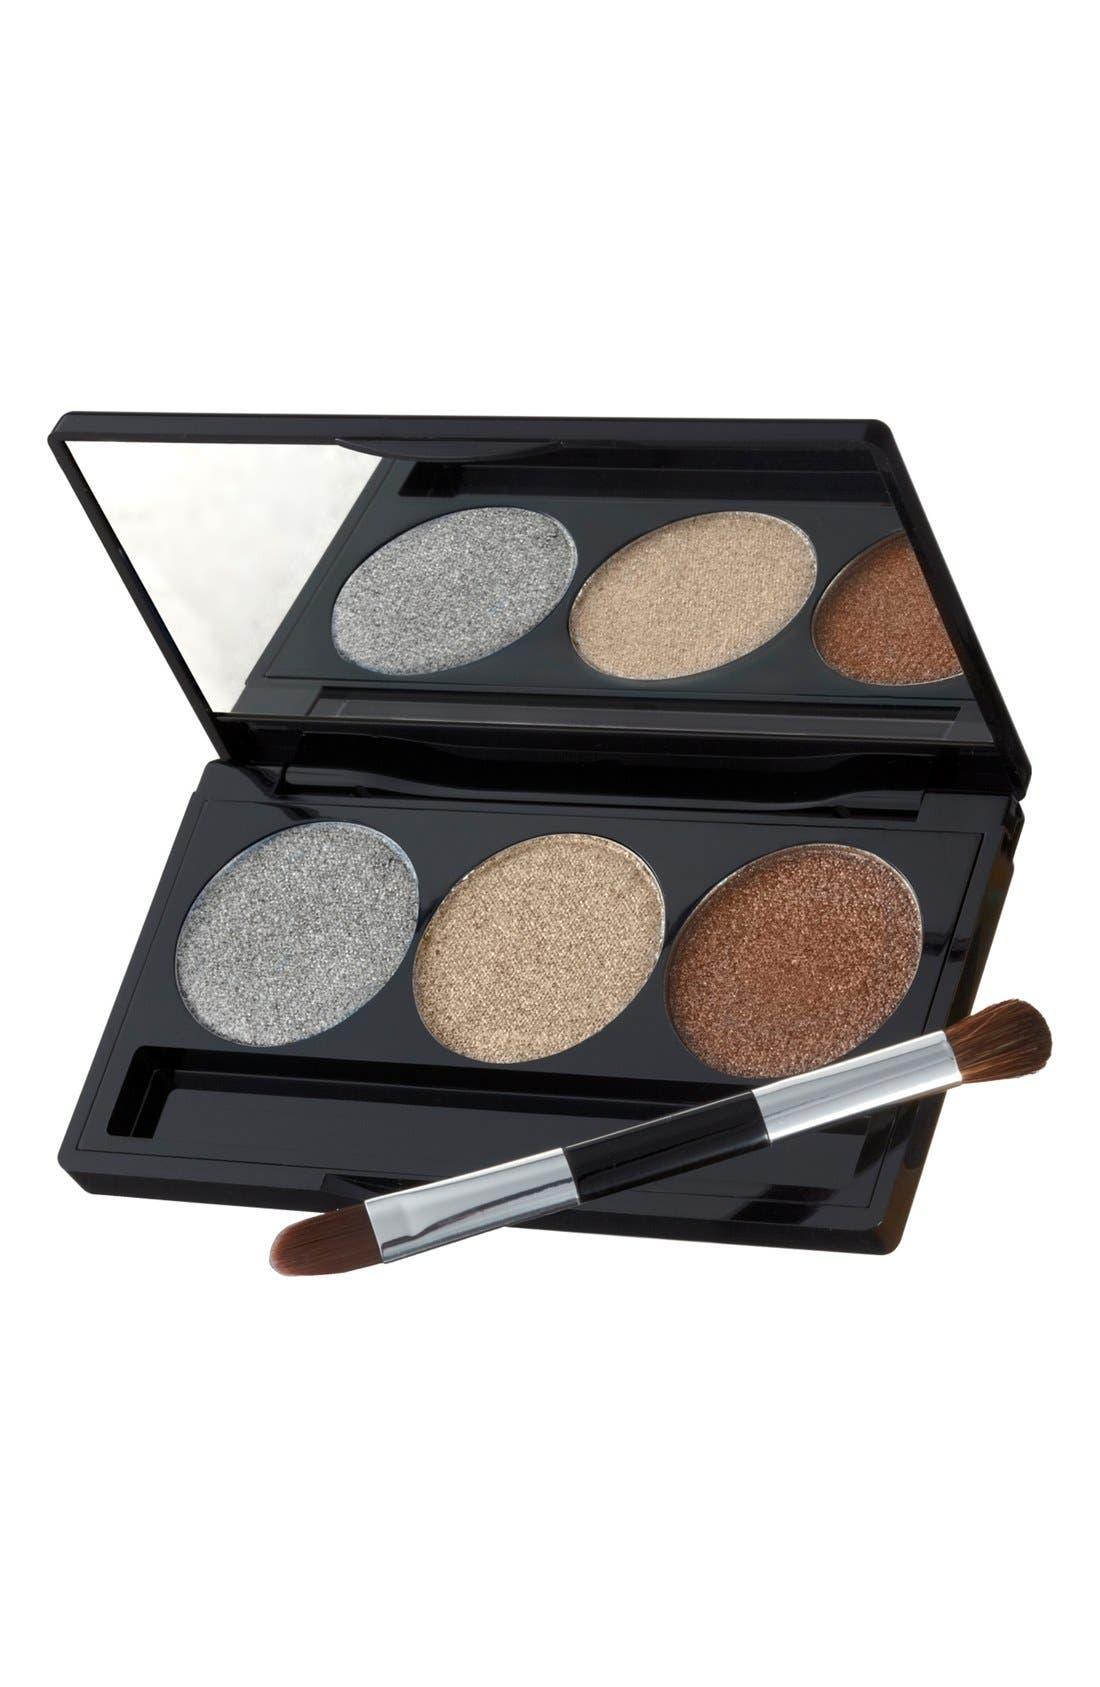 Laura Geller Beauty Crème Glaze Intensifying Baked Eyeshadow Palette ($49 Value)